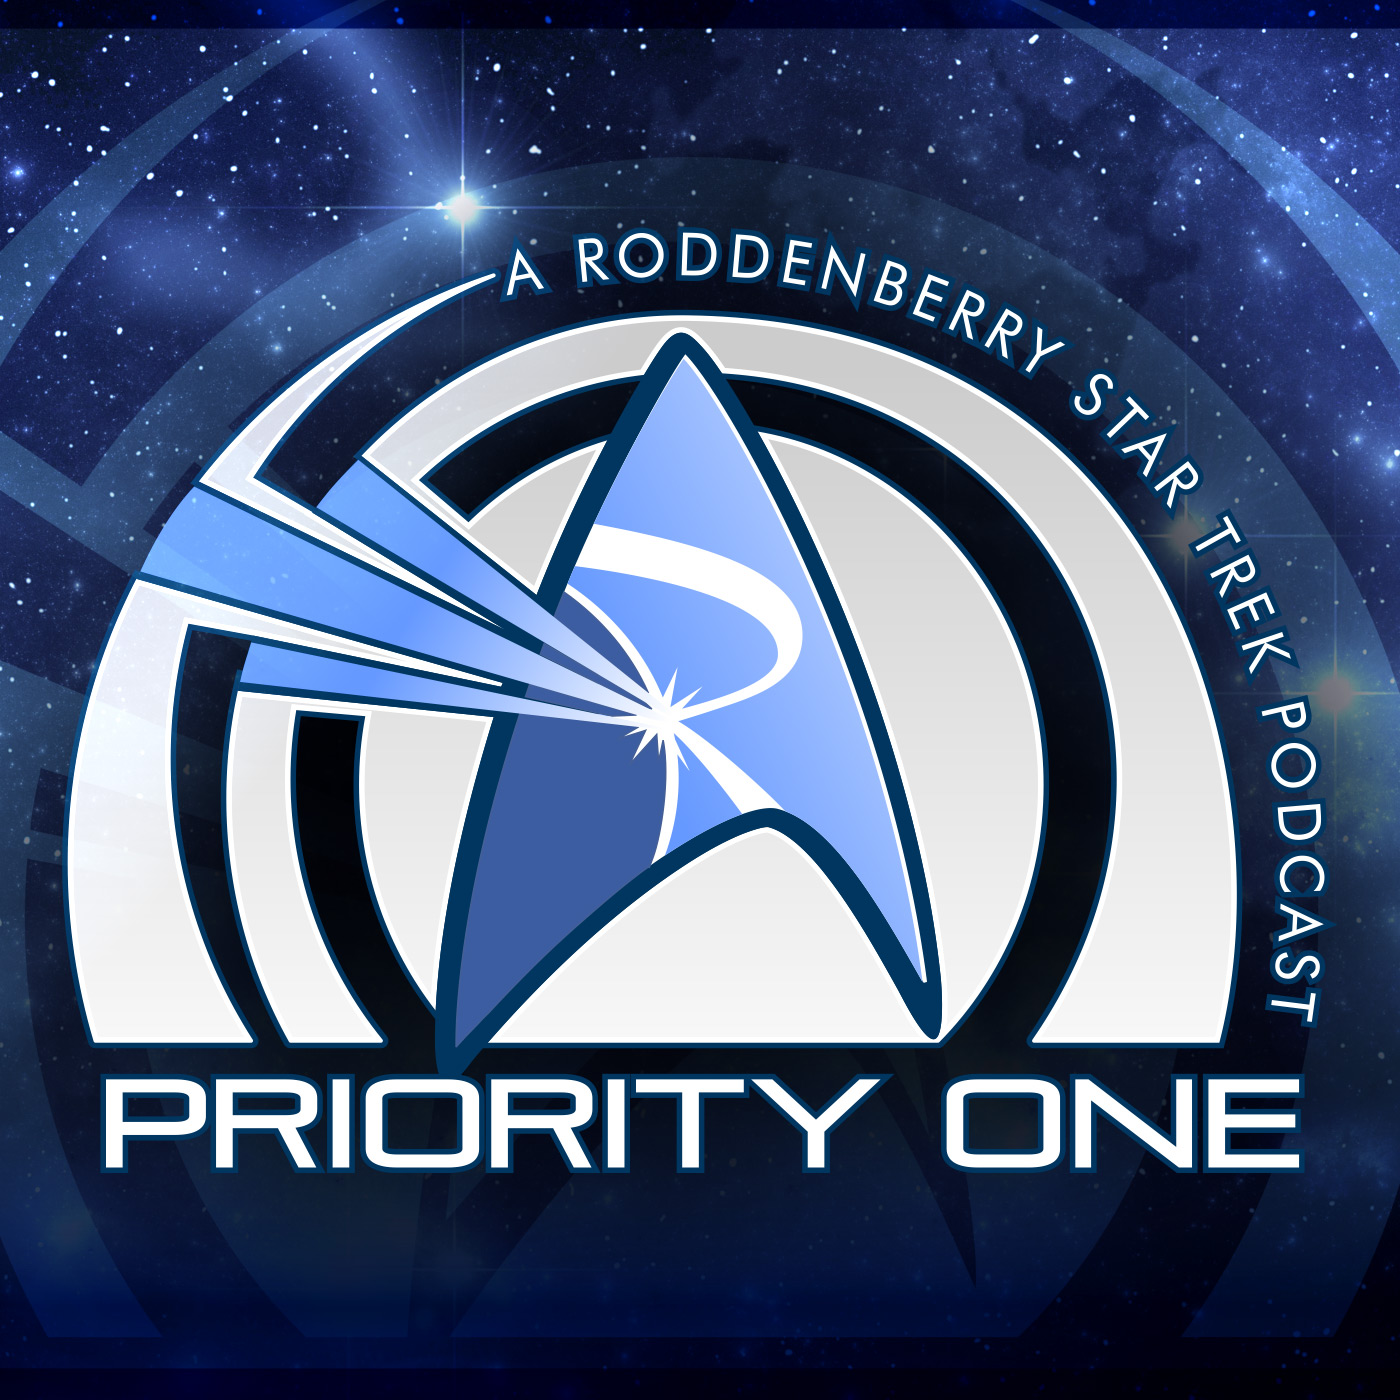 Artwork for 404 - Not Found | Priority One: A Roddenberry Star Trek Podcast